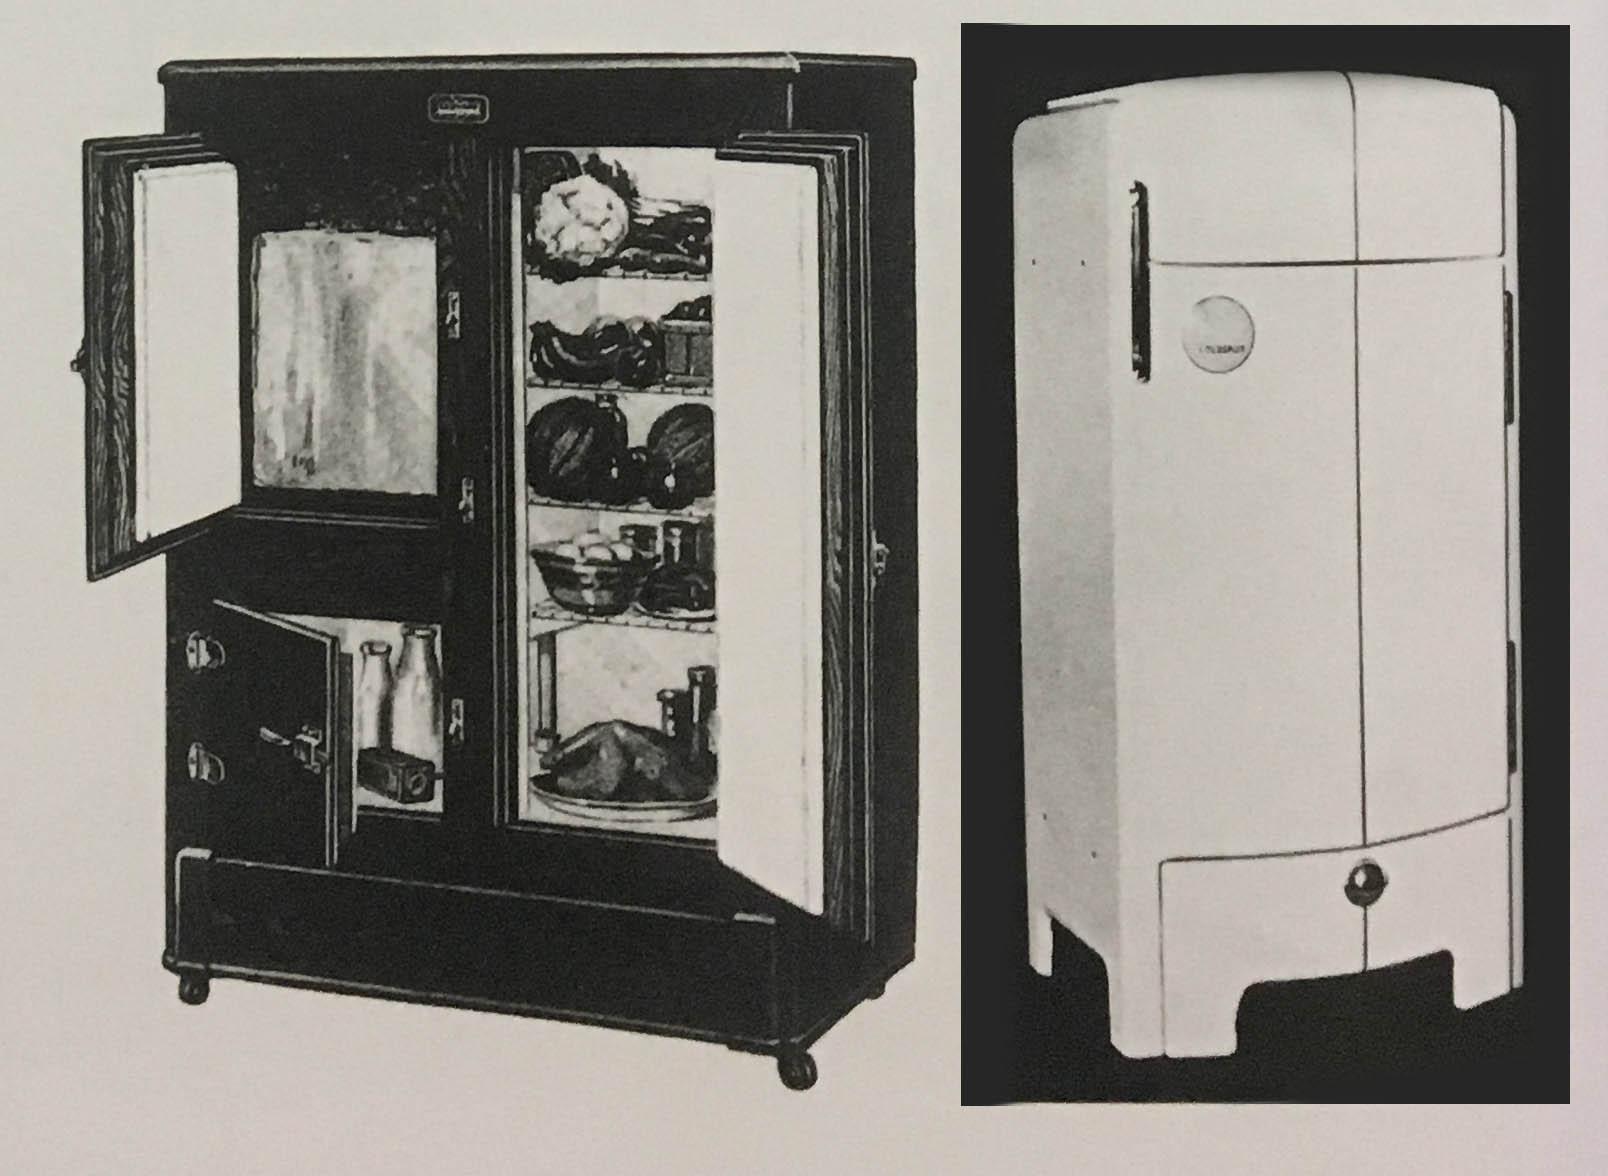 Left: The Leonard Refrigerator (1929). Right: Sears Roebuck Coldspot Refrigerator (1935). Objects of Desire.